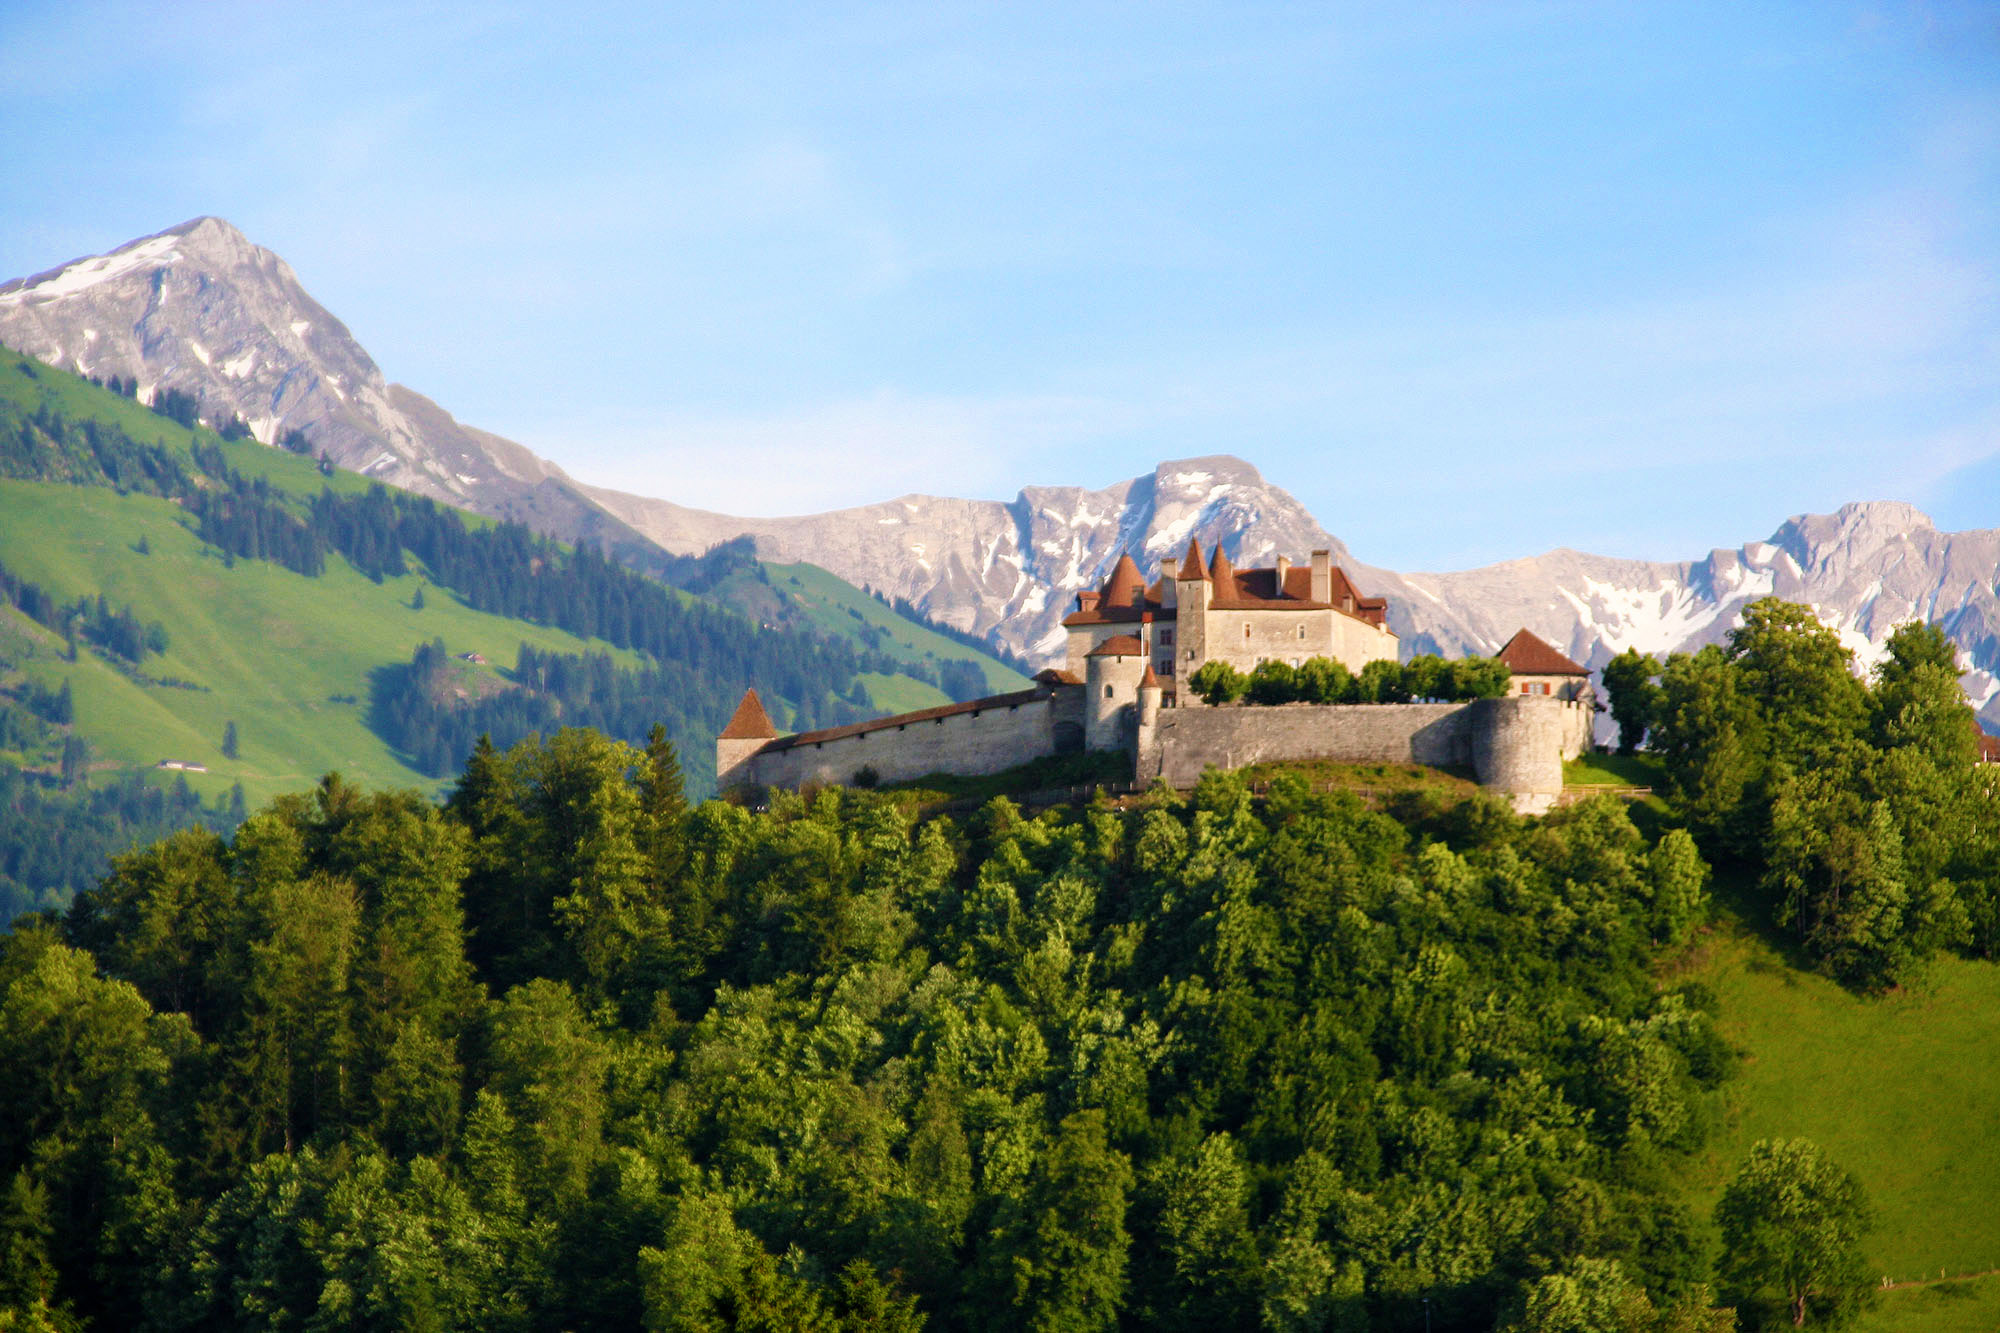 kt_2020_350_Keytours_excursions_Swisstours_gruyères_village6_2048_10